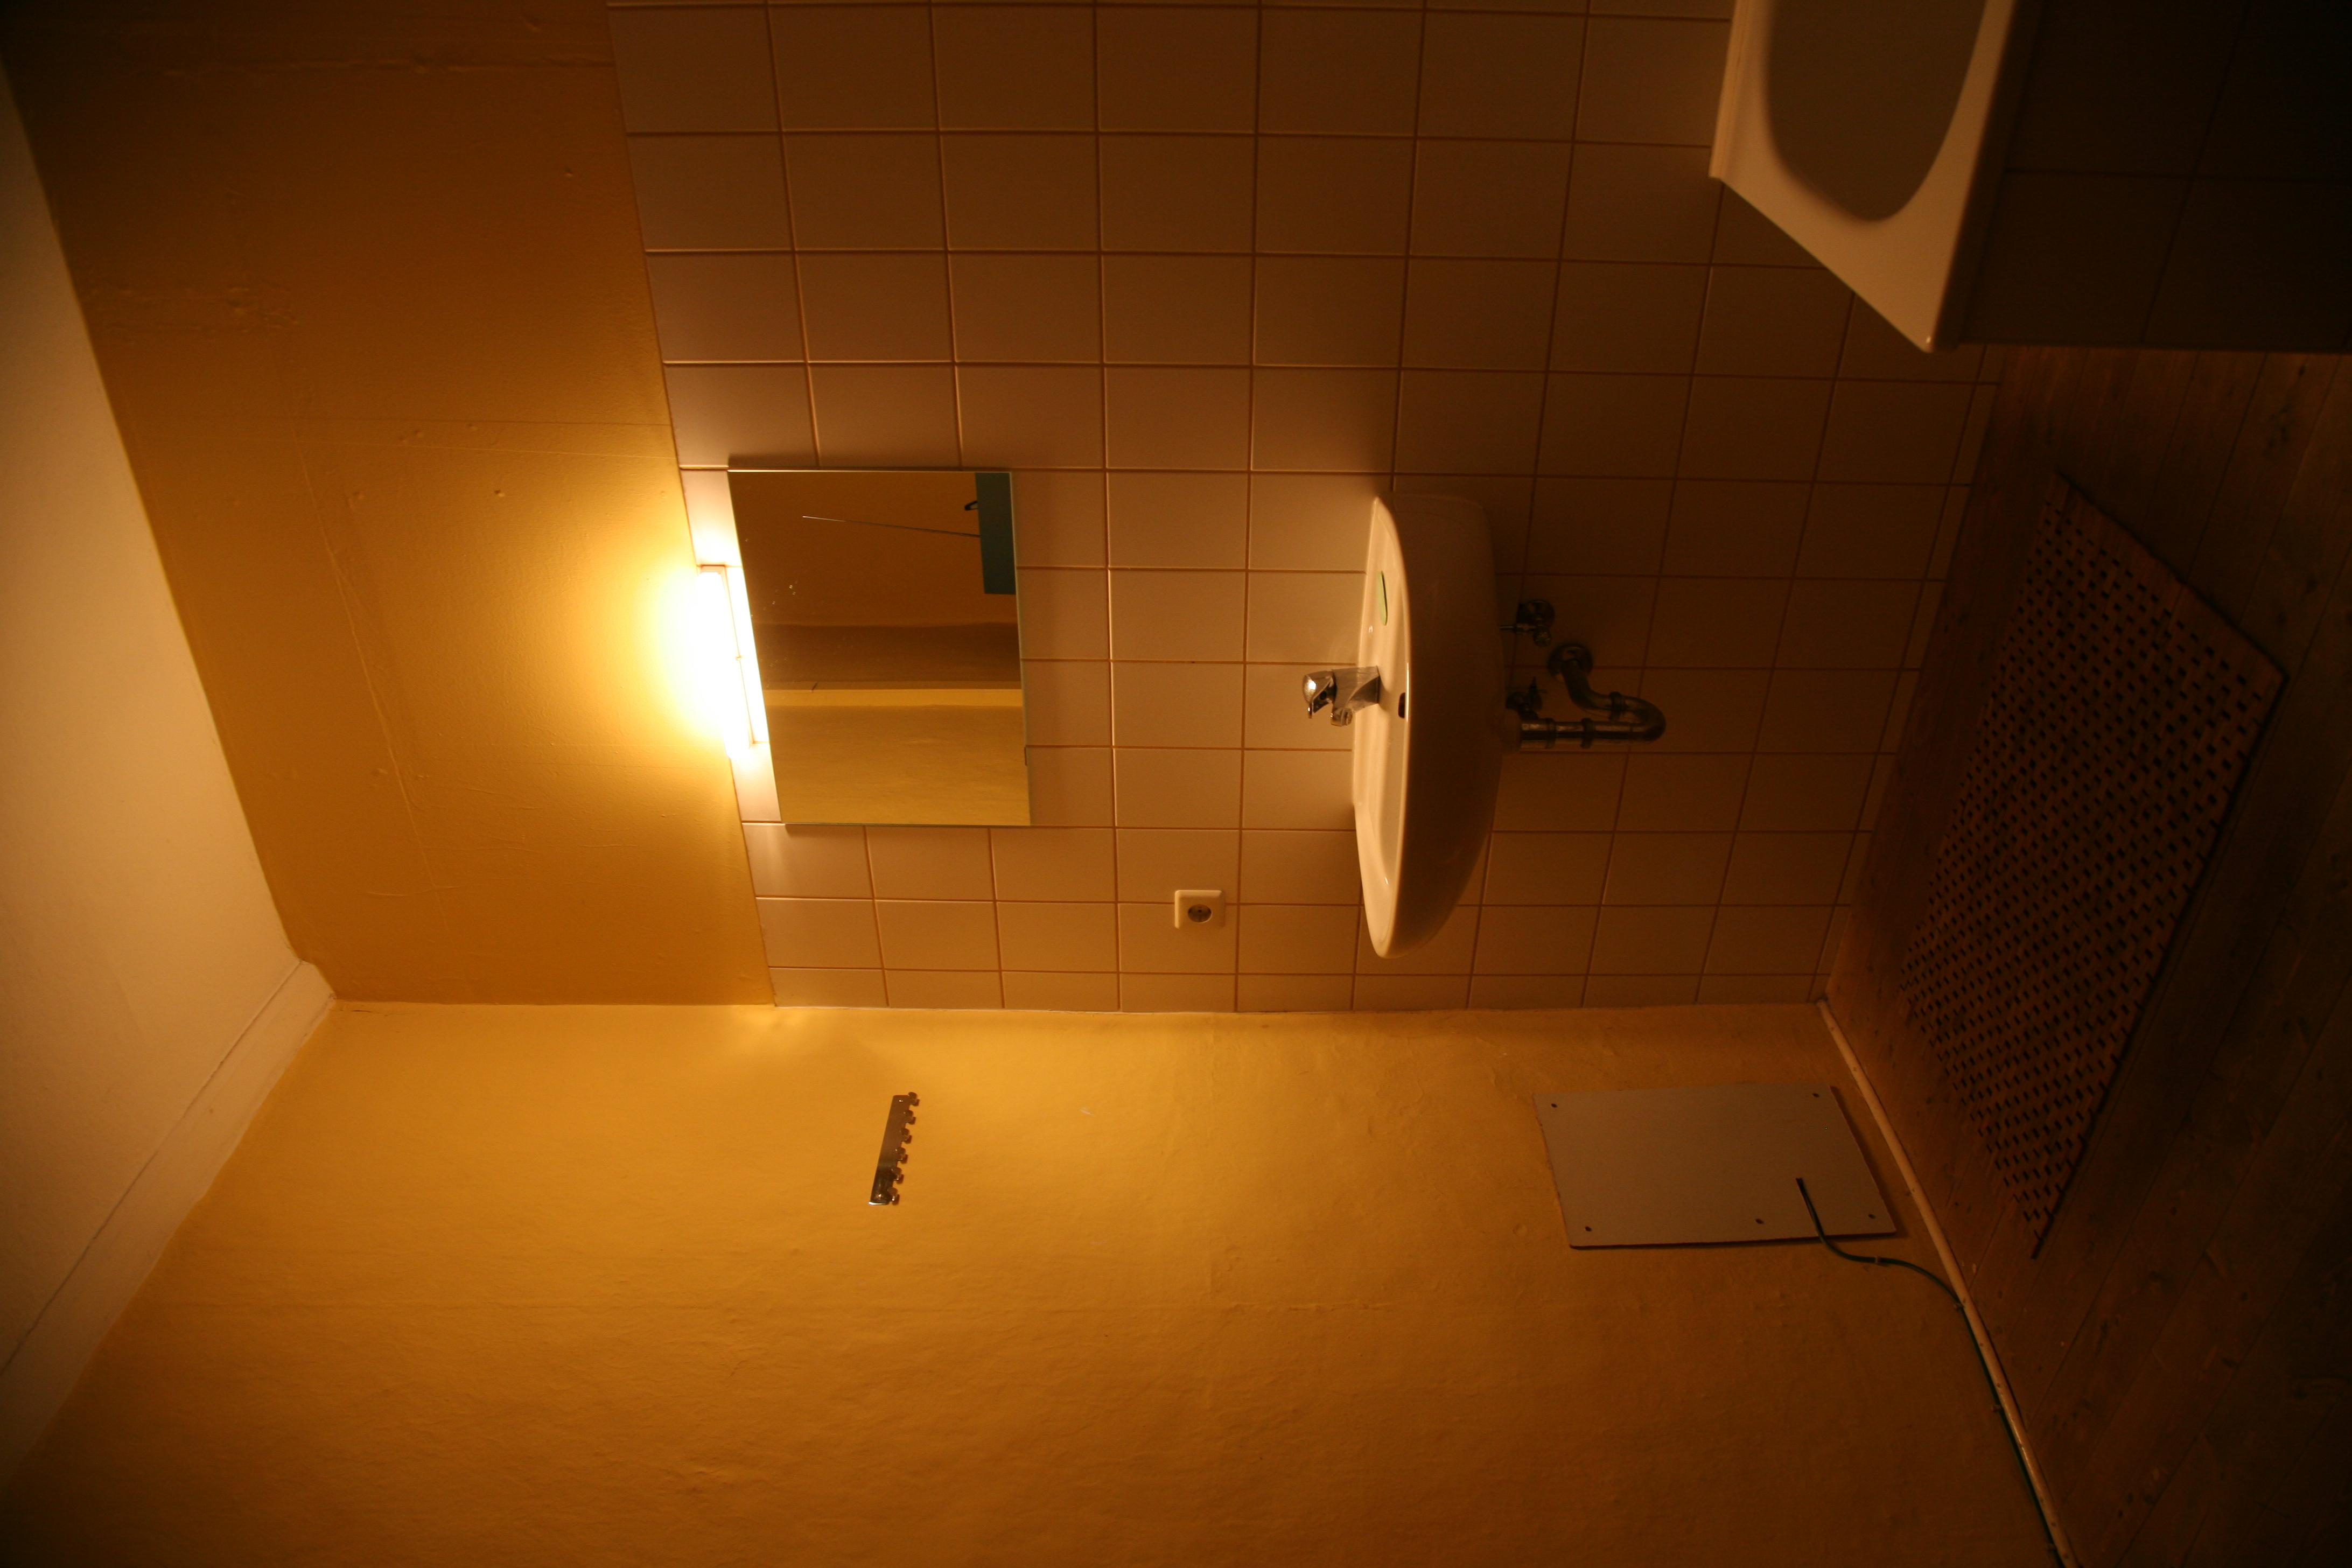 Salle De Bain Allemagne free images : house, floor, room, lighting, apartment